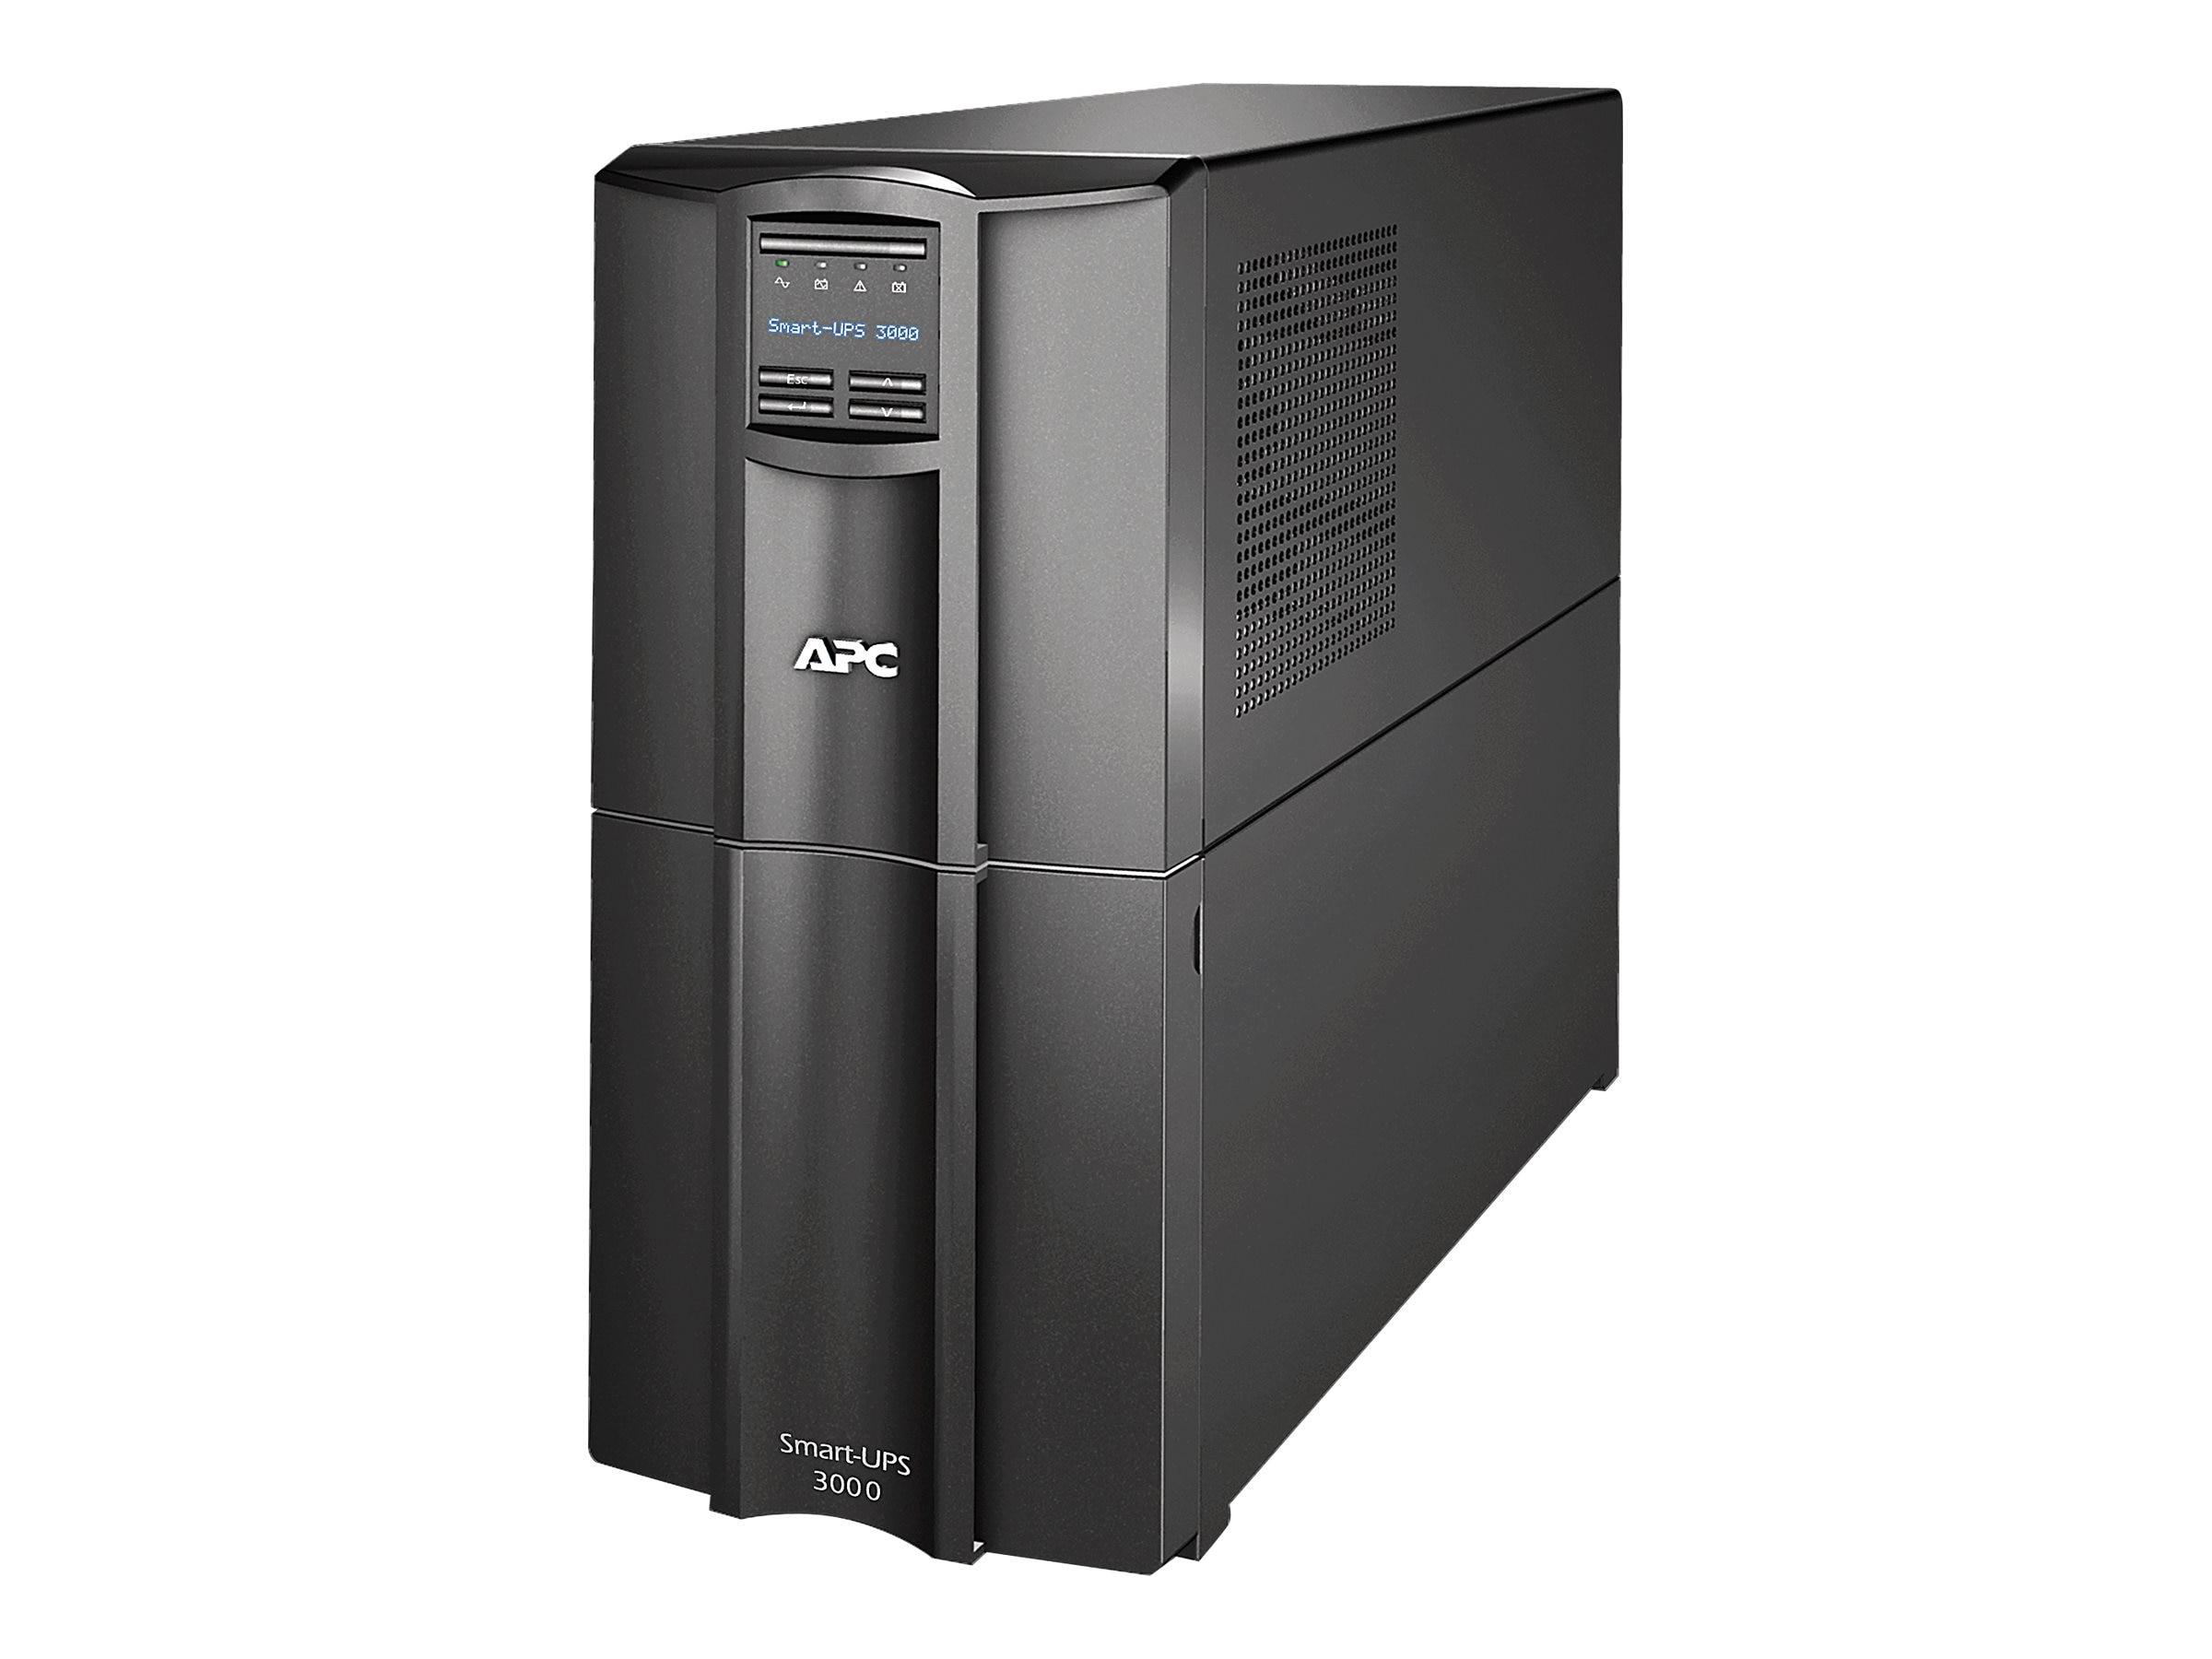 APC Smart-UPS 3000VA 2700W LCD UPS, Serial USB, SMT3000, 10335349, Battery Backup/UPS